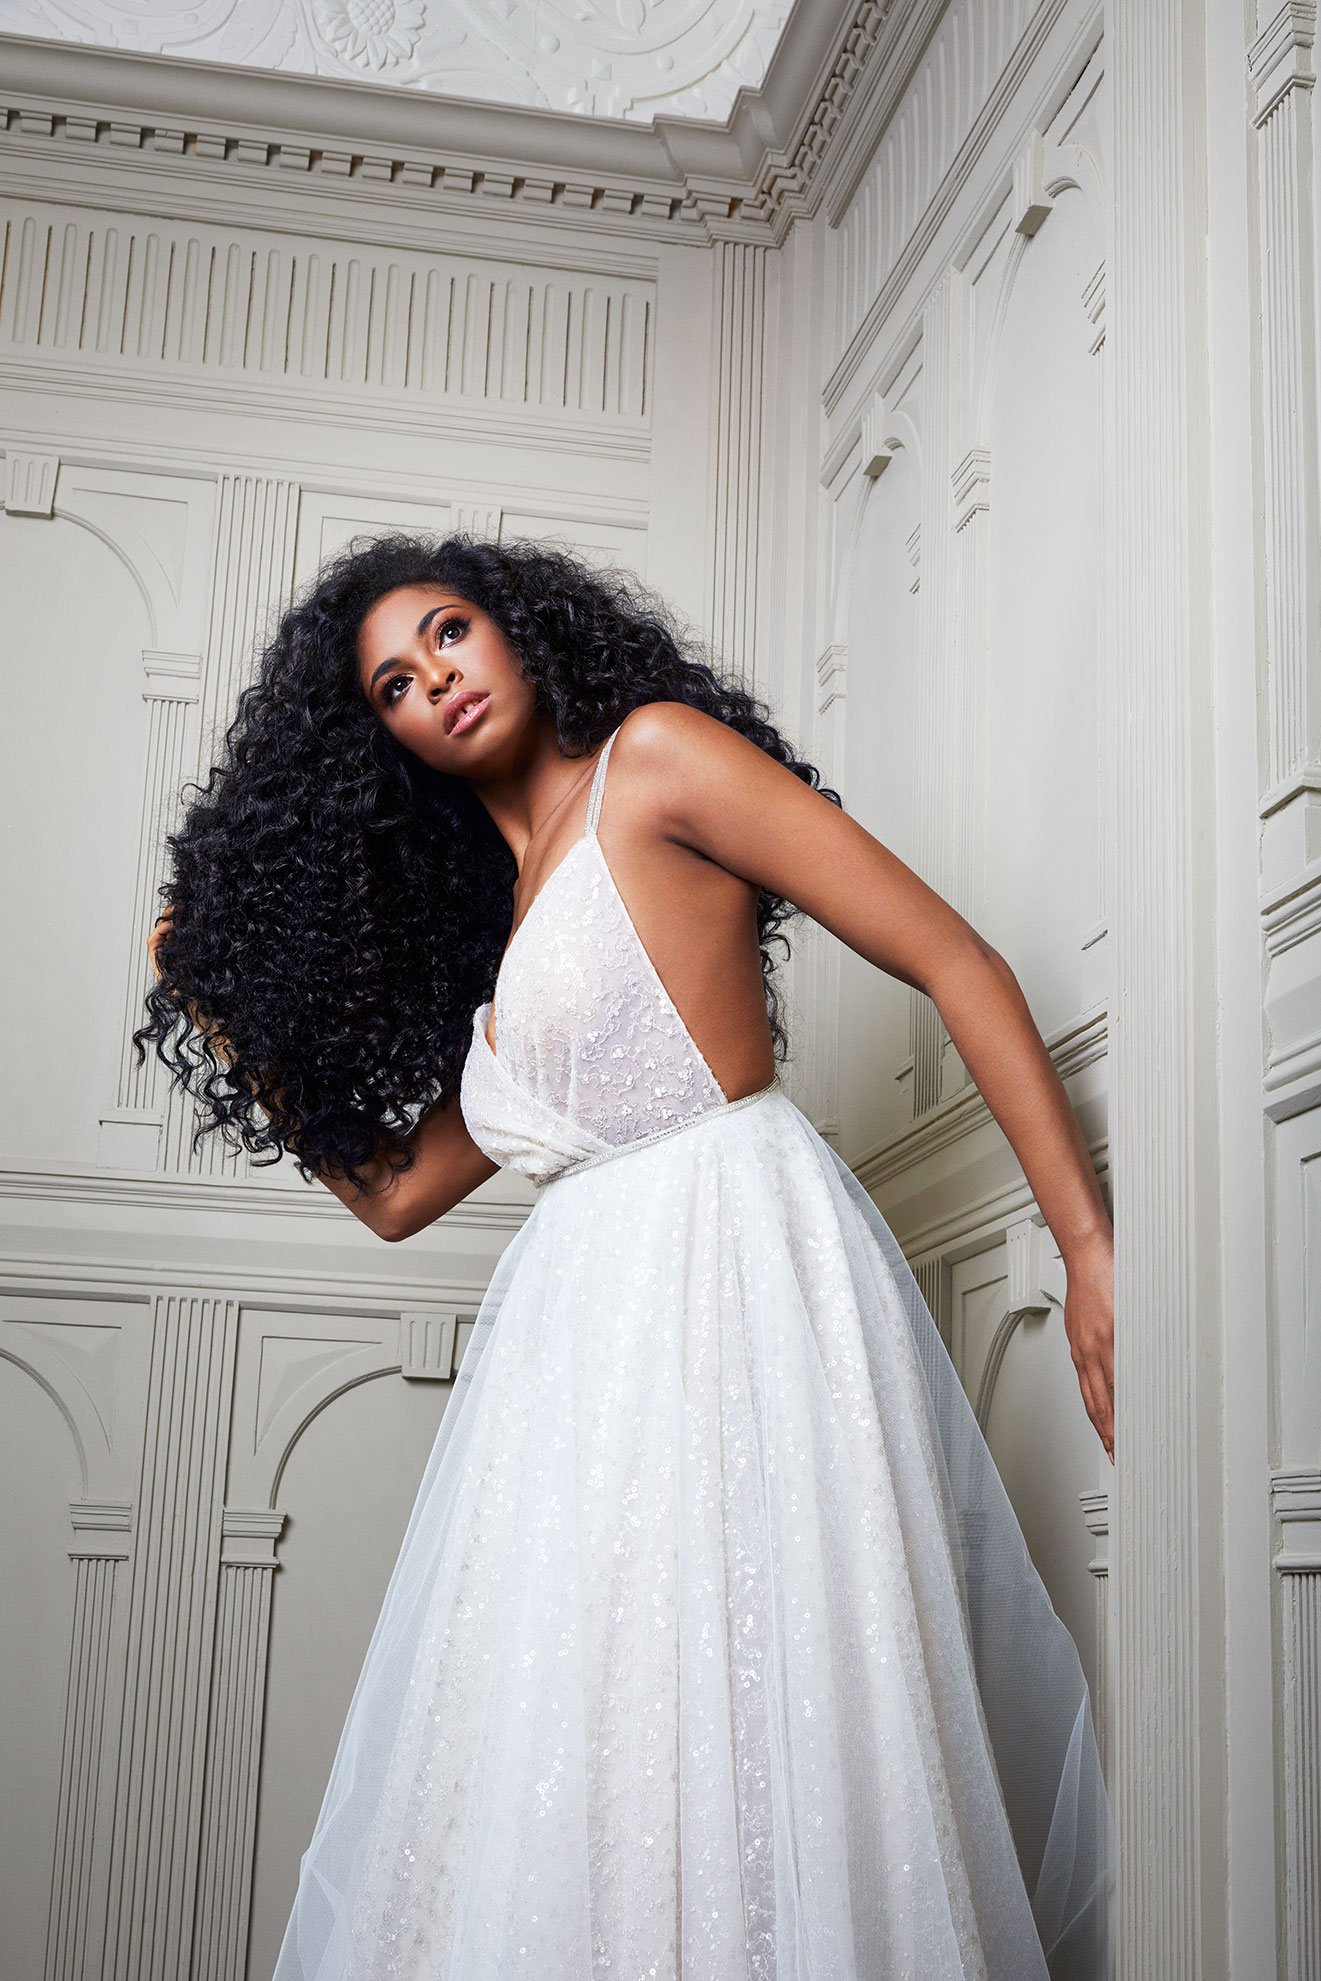 Bridal hair extension campaign